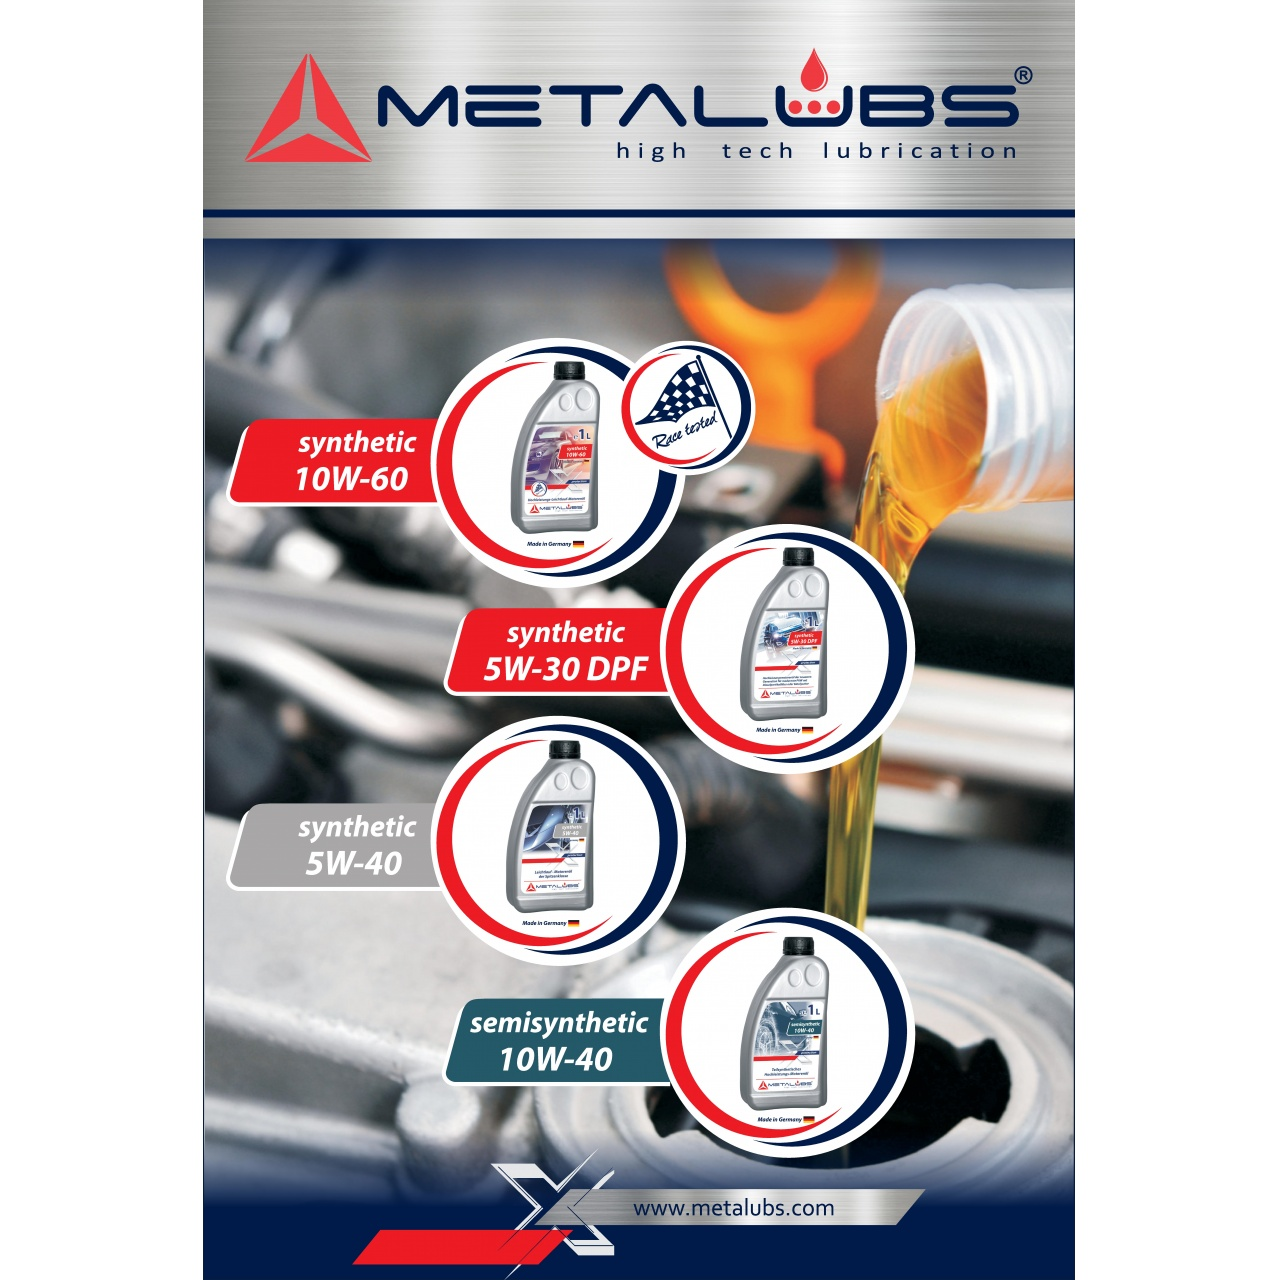 Metalubs poster 60×88 cm